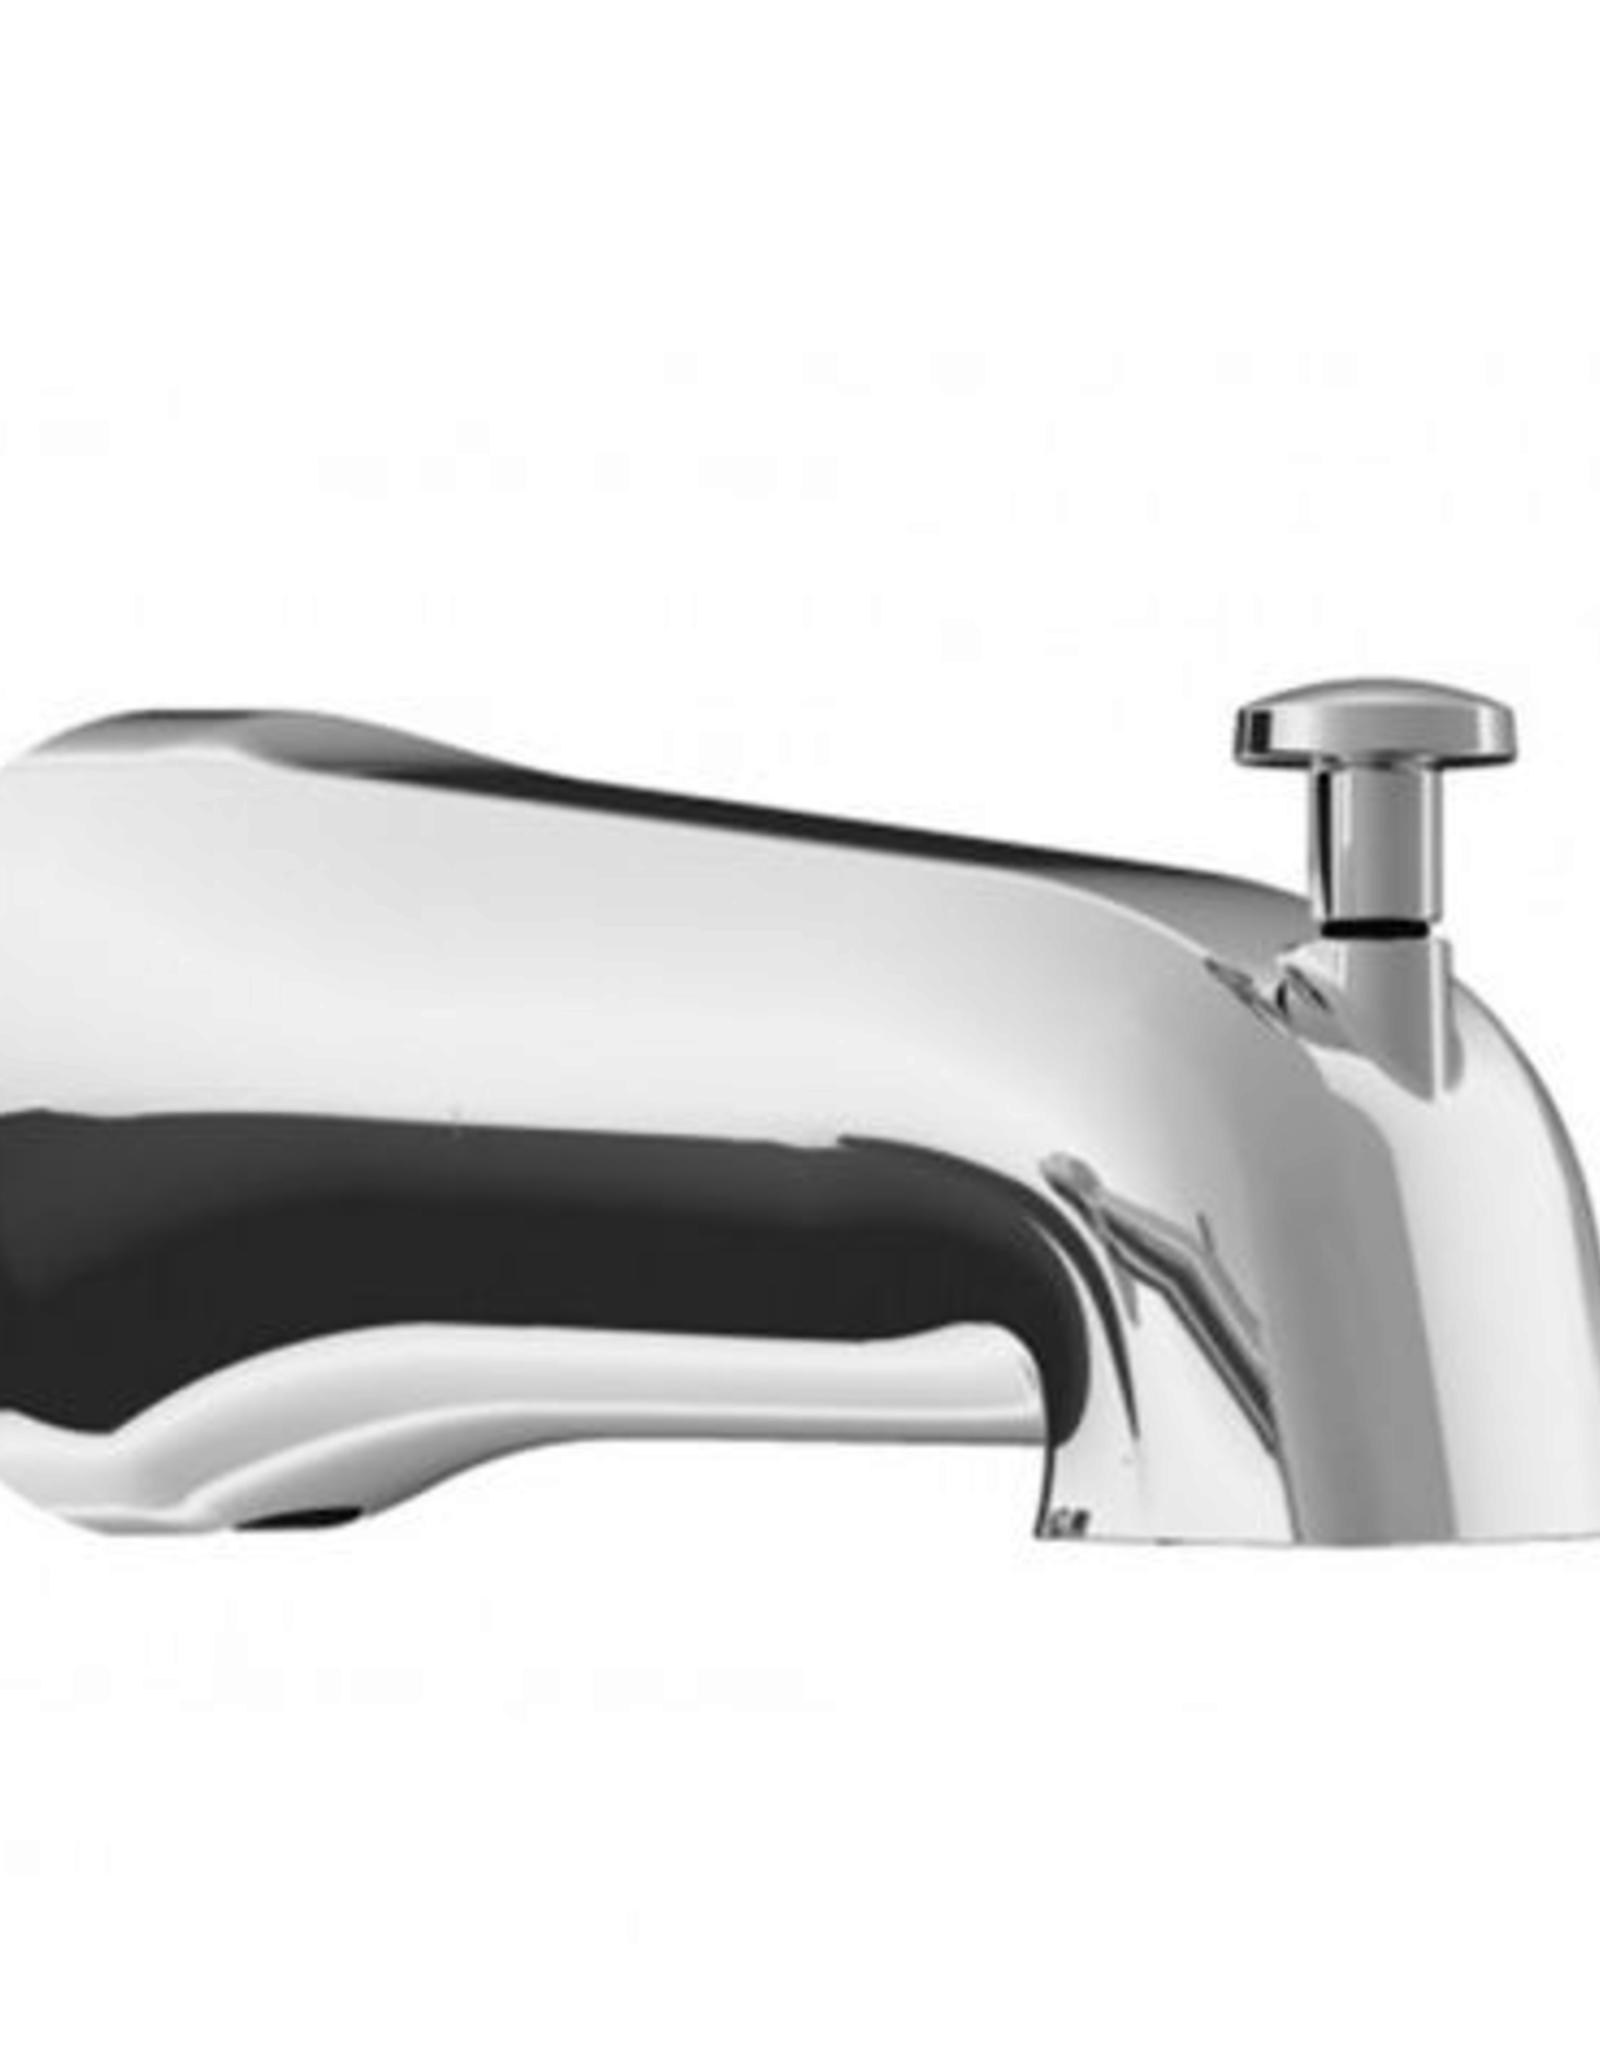 Kalia Kalia Sobrio PB6- Hand Shower w/ Diverter Tub Spout- Chrome